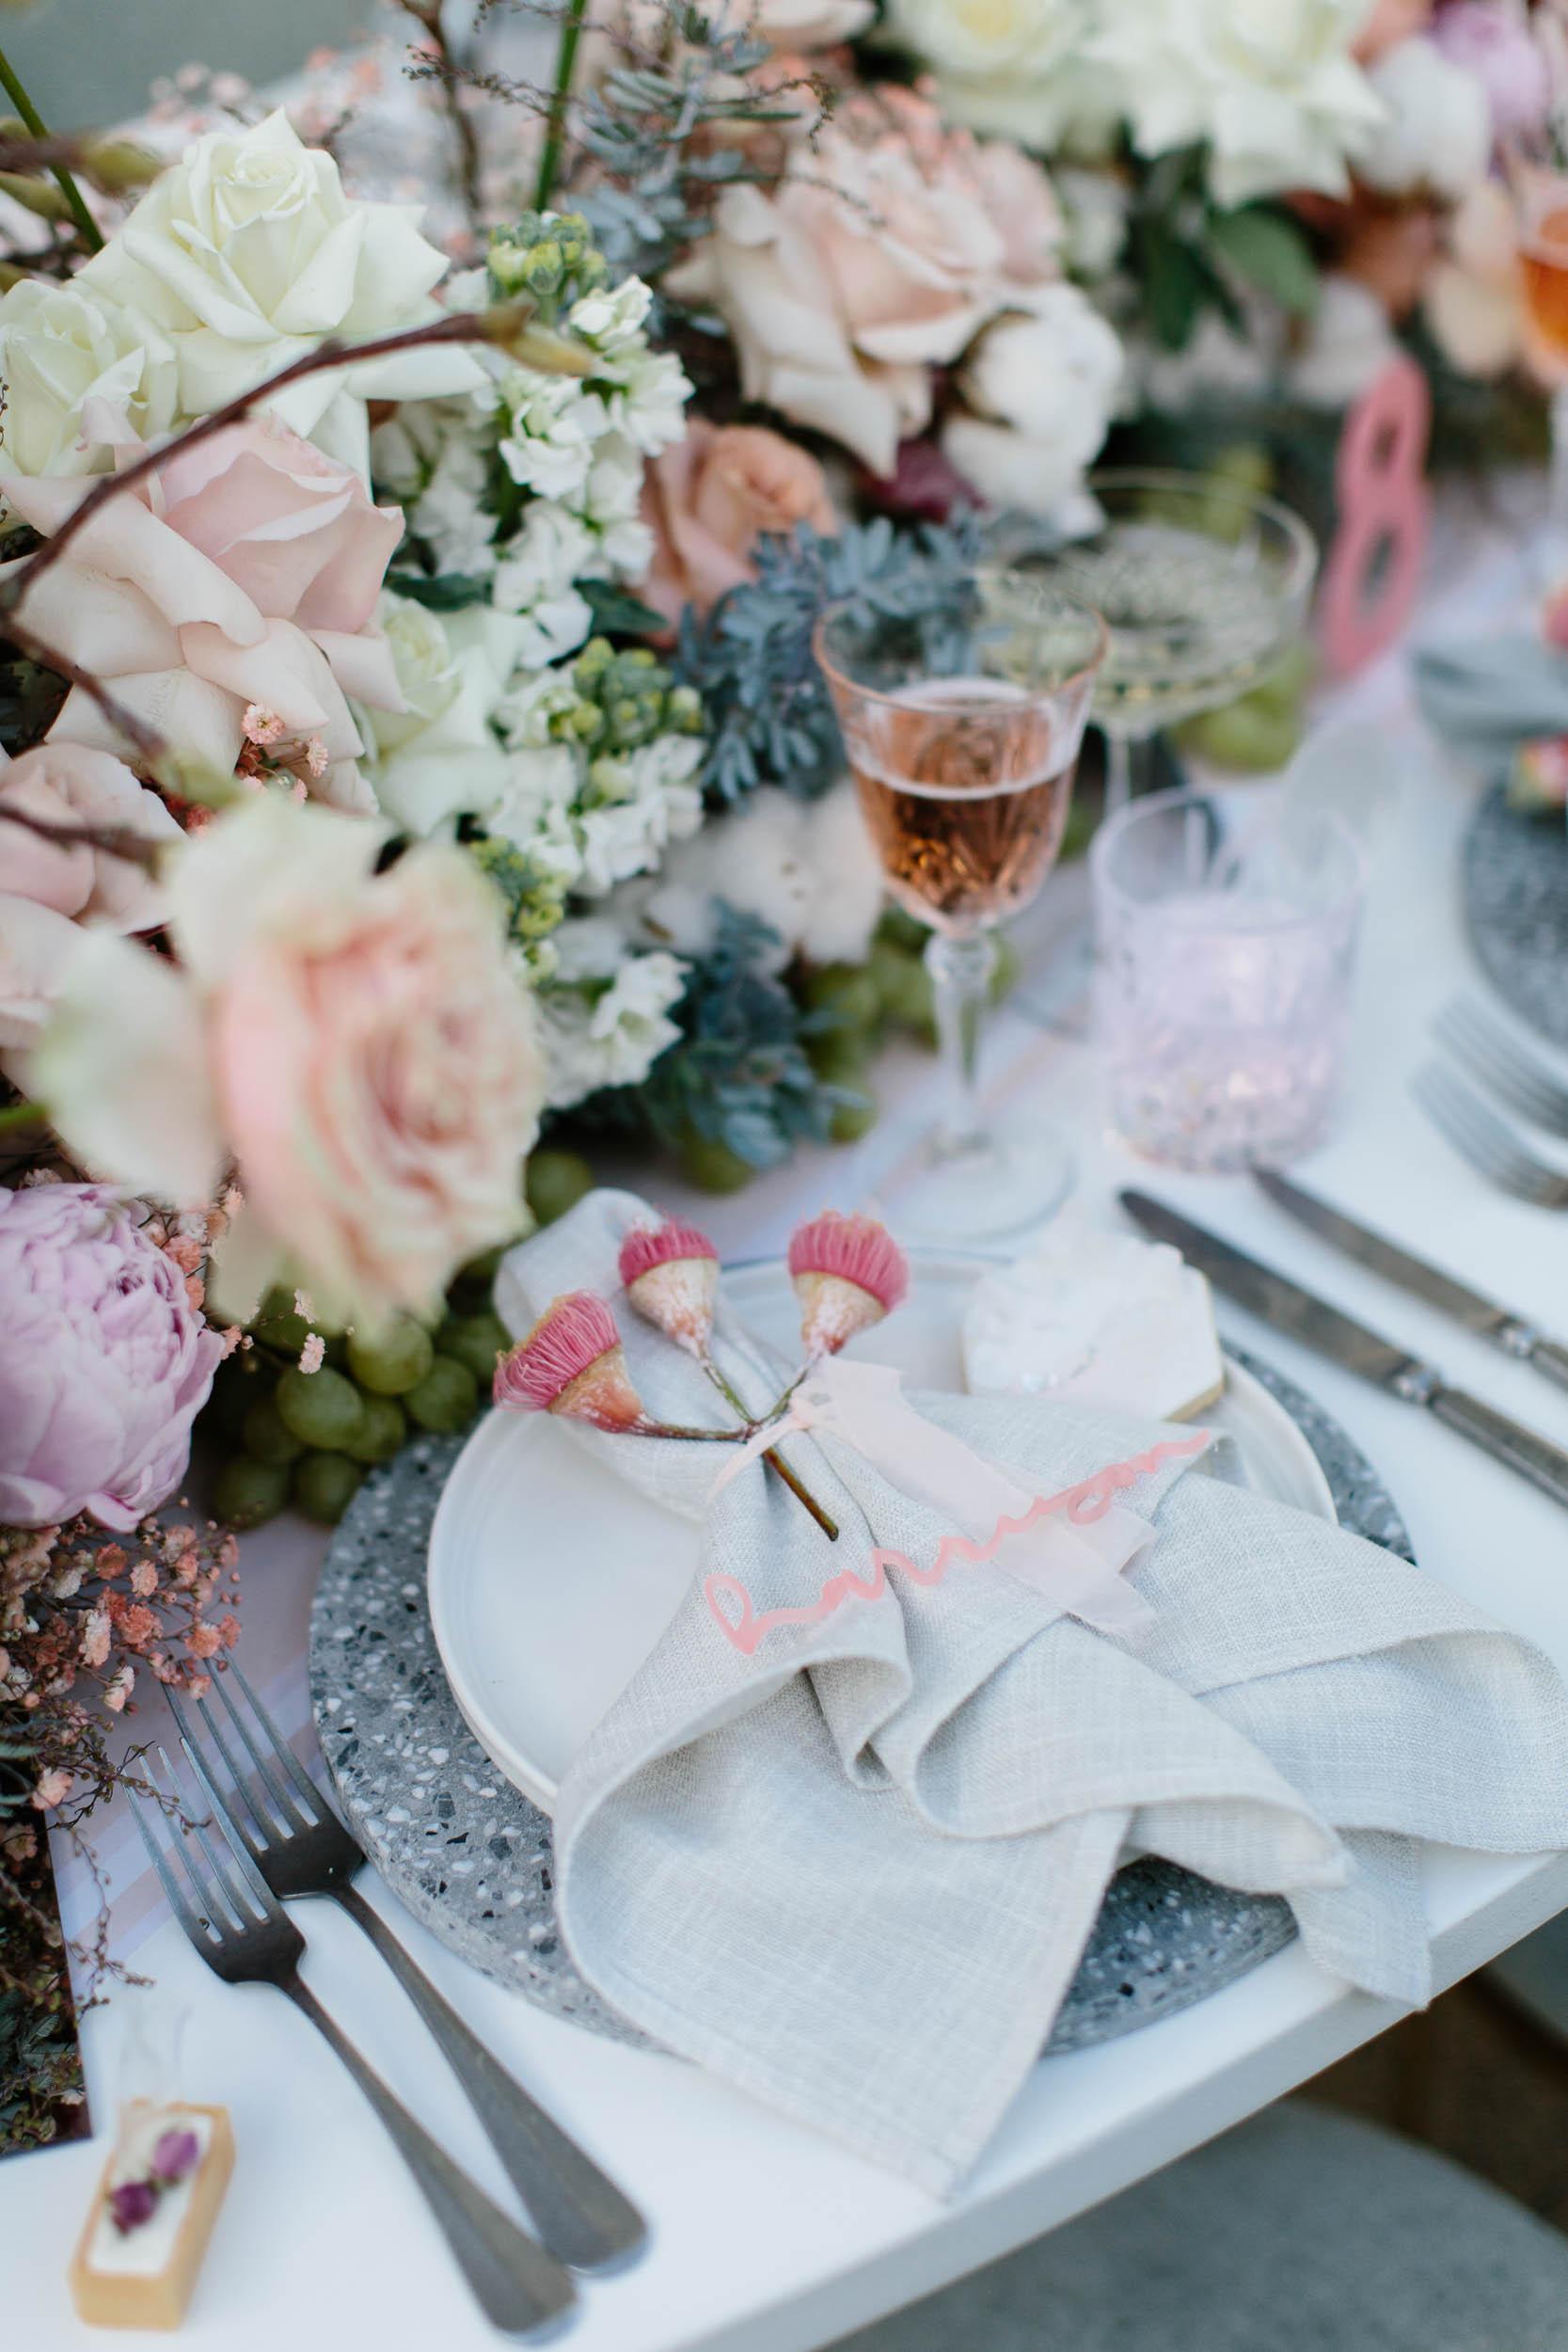 Kas-Richards-LENZO-Yarra-Valley-Wedding-One-Day-Bridal-36.jpg